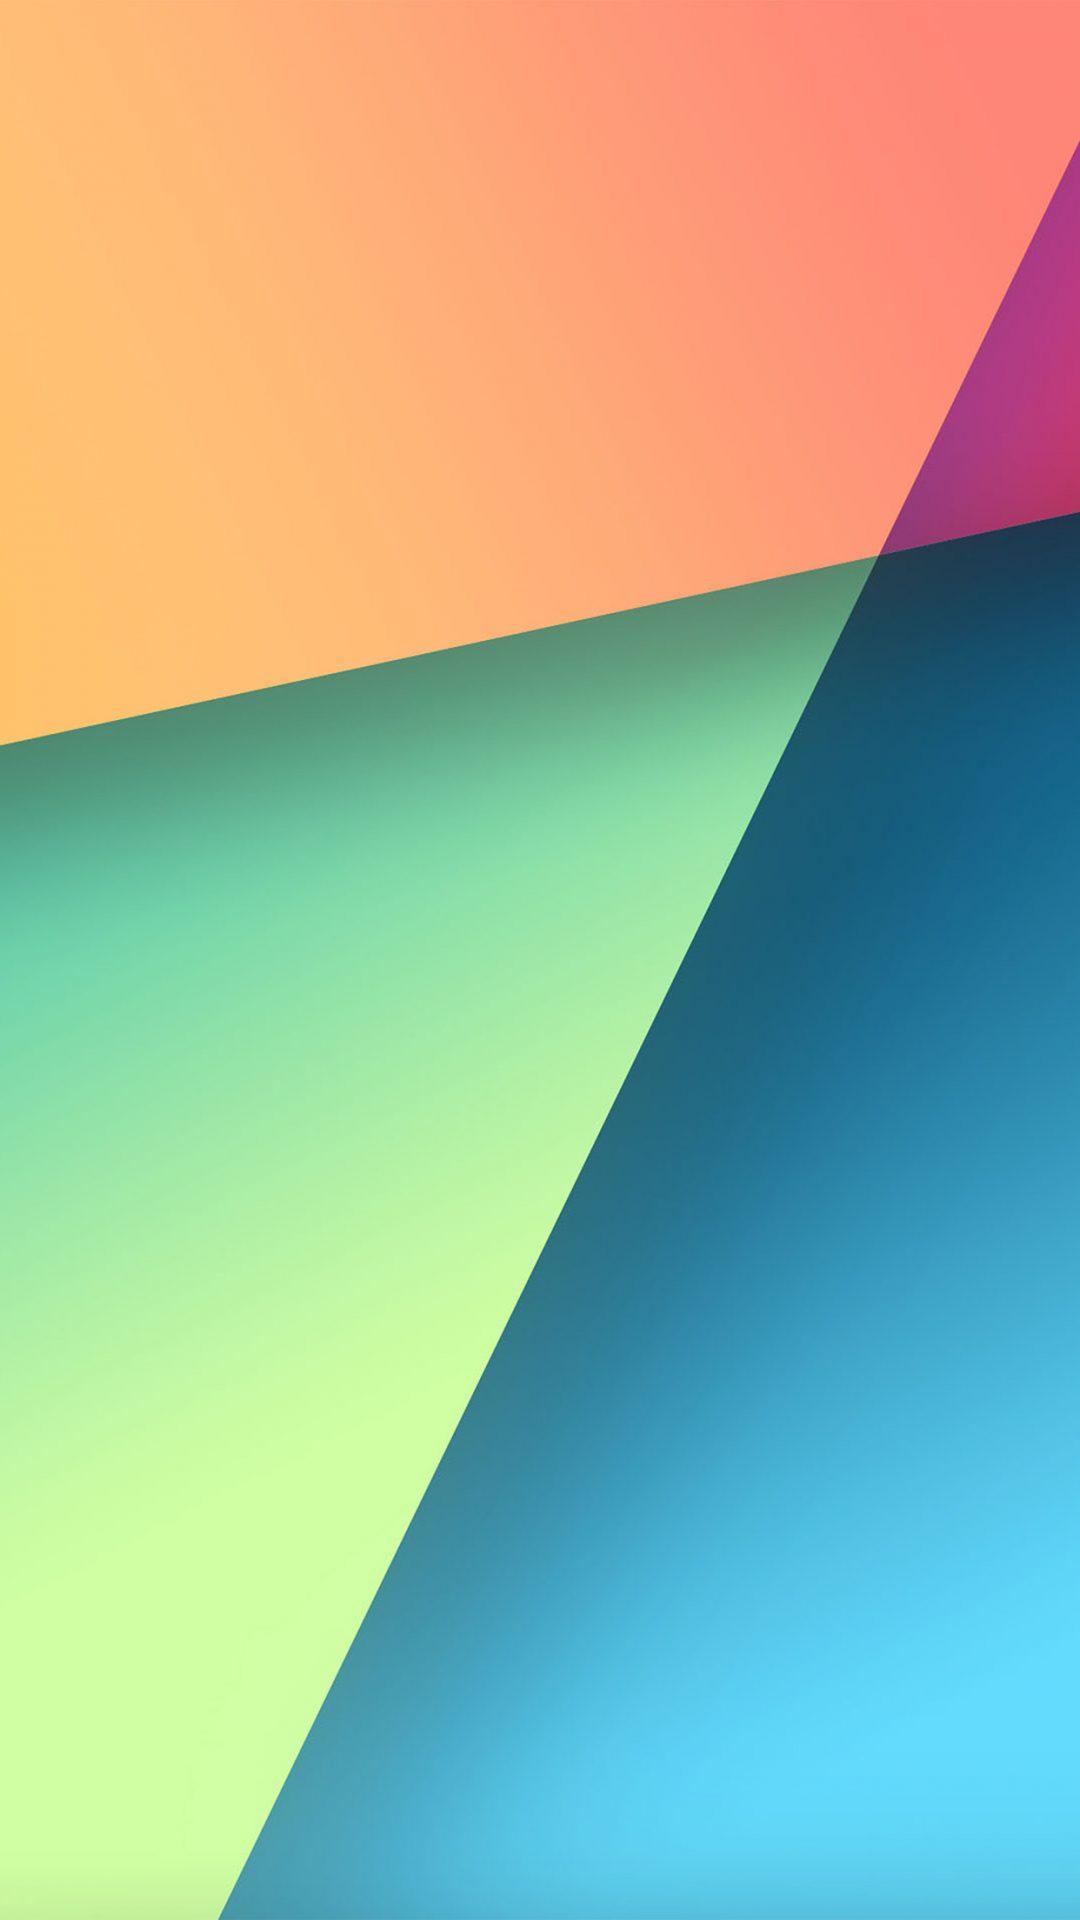 Lollipop Background Android Rainbow Pattern